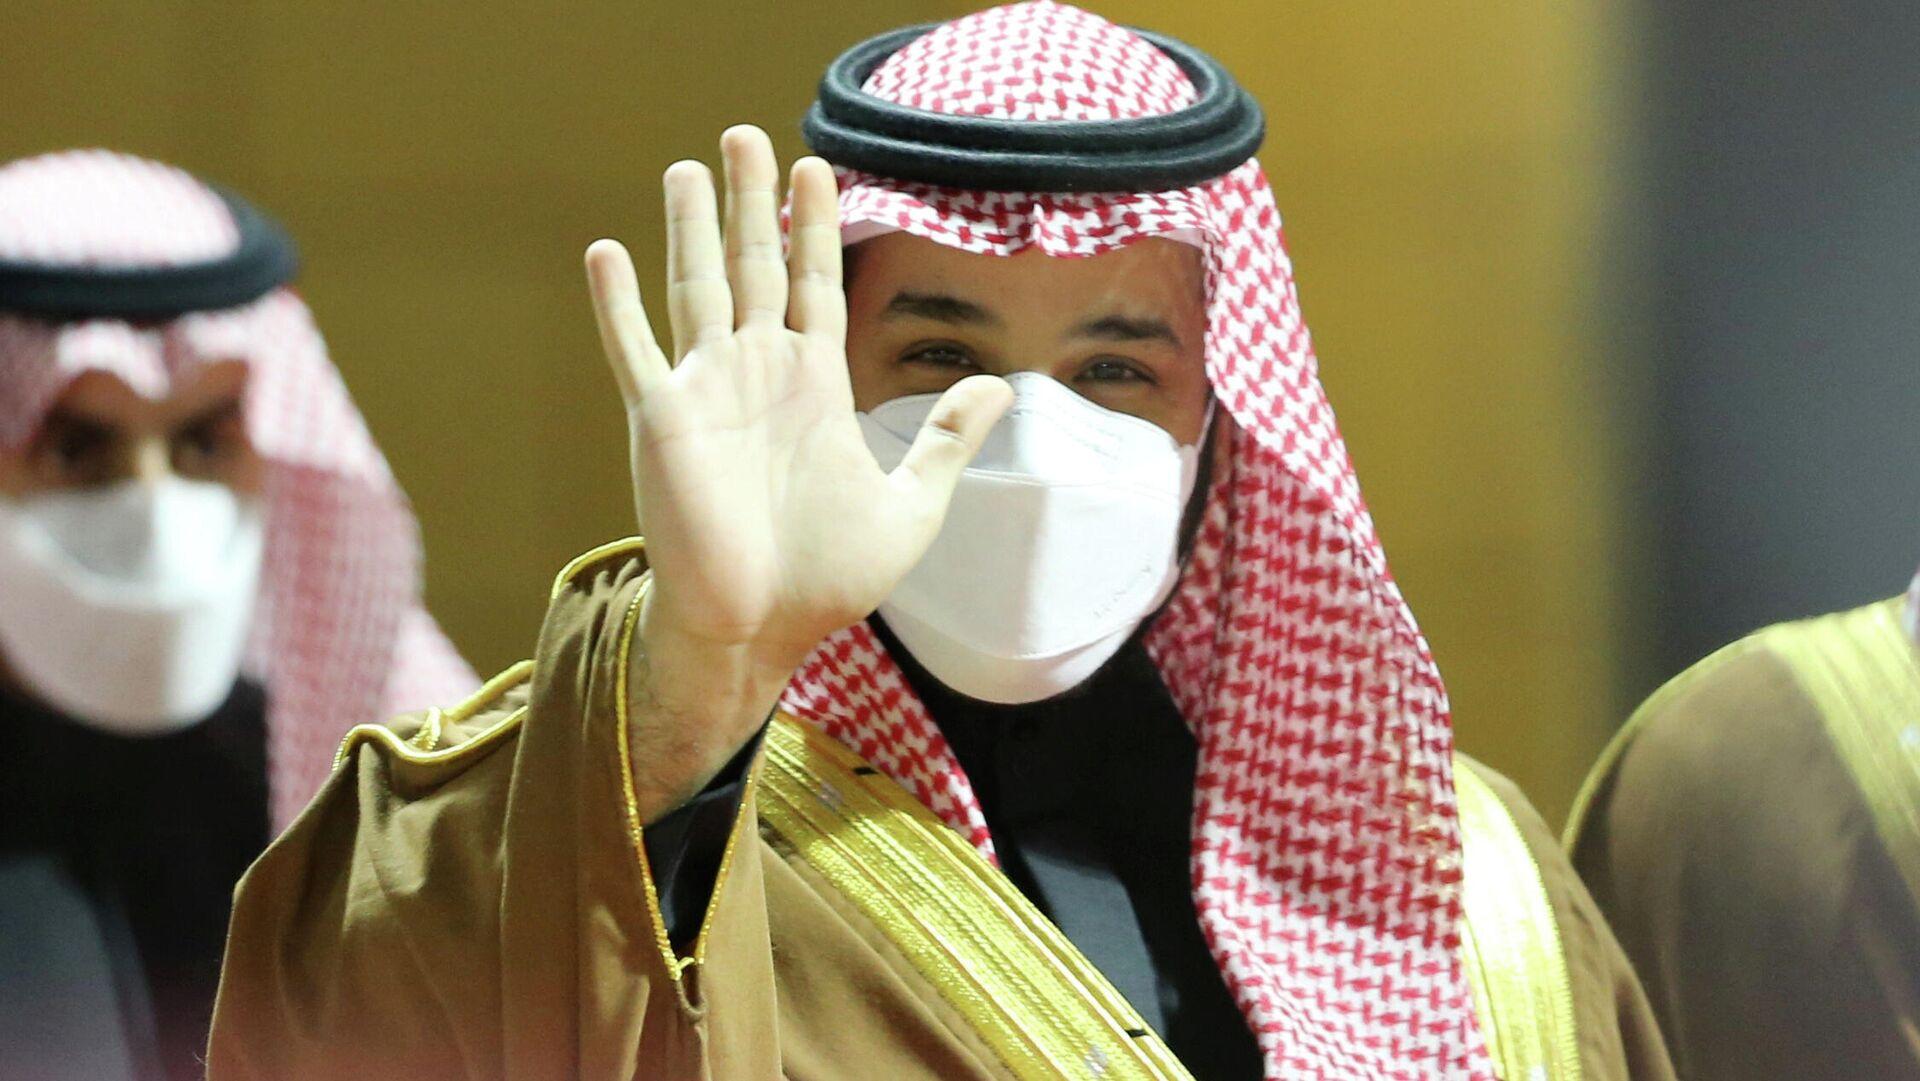 Mohammed bin Salman, príncipe heredero de Arabia Saudí - Sputnik Mundo, 1920, 31.03.2021